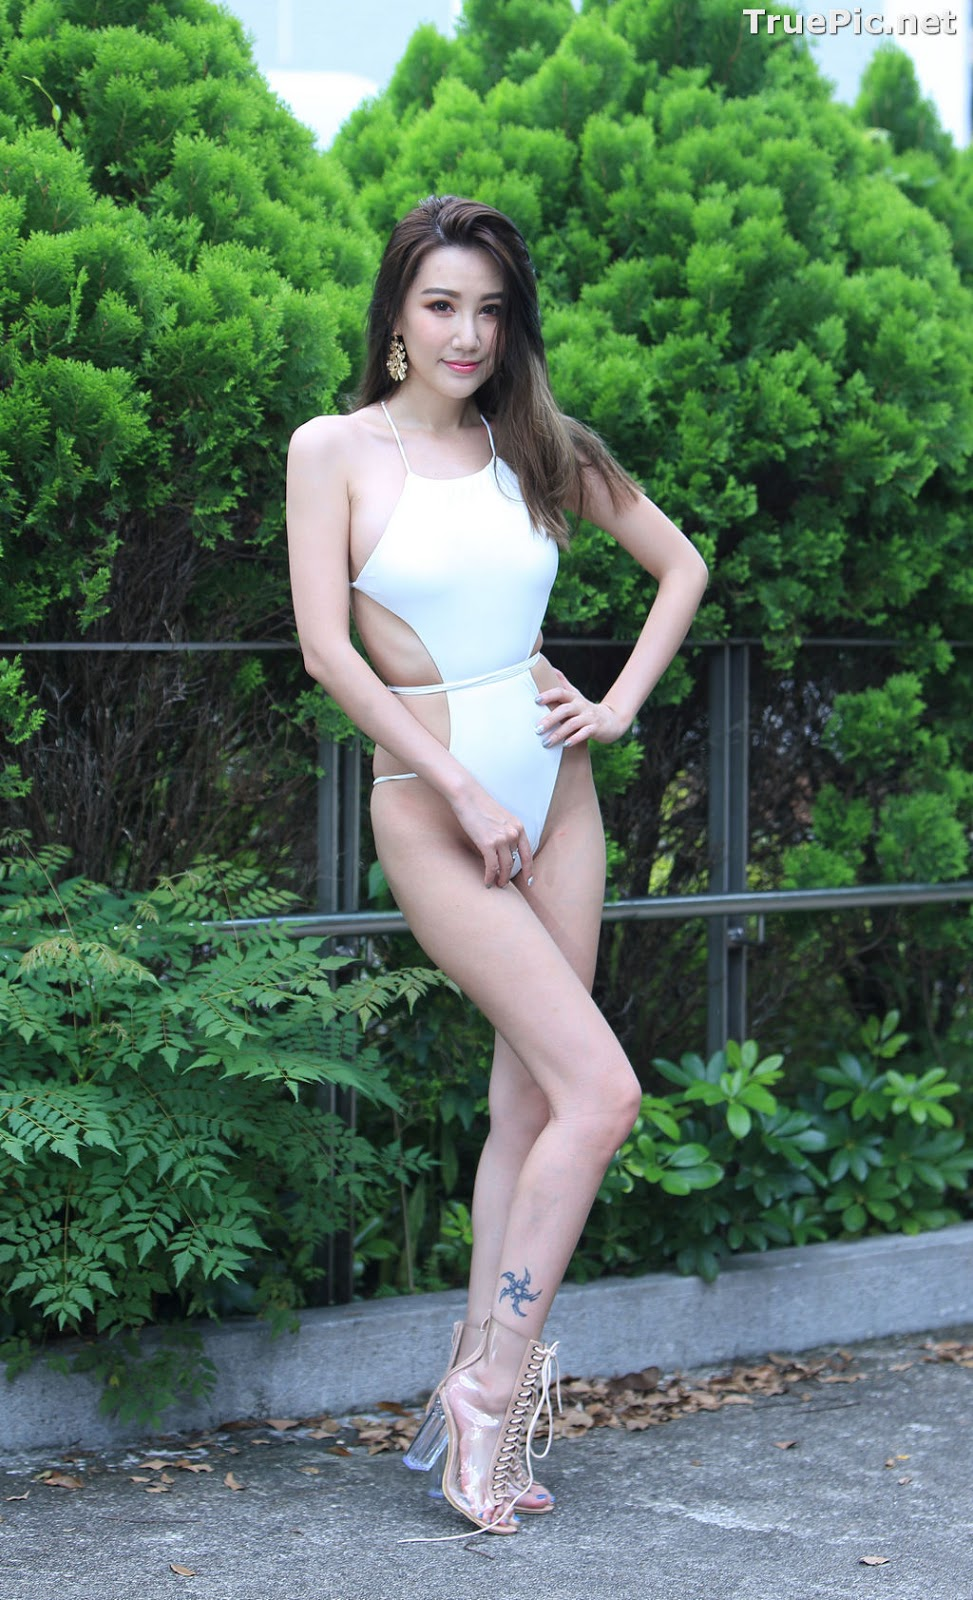 Image Taiwanese Beautiful Model - Suki - White Sexy Bikini Girl - TruePic.net - Picture-1